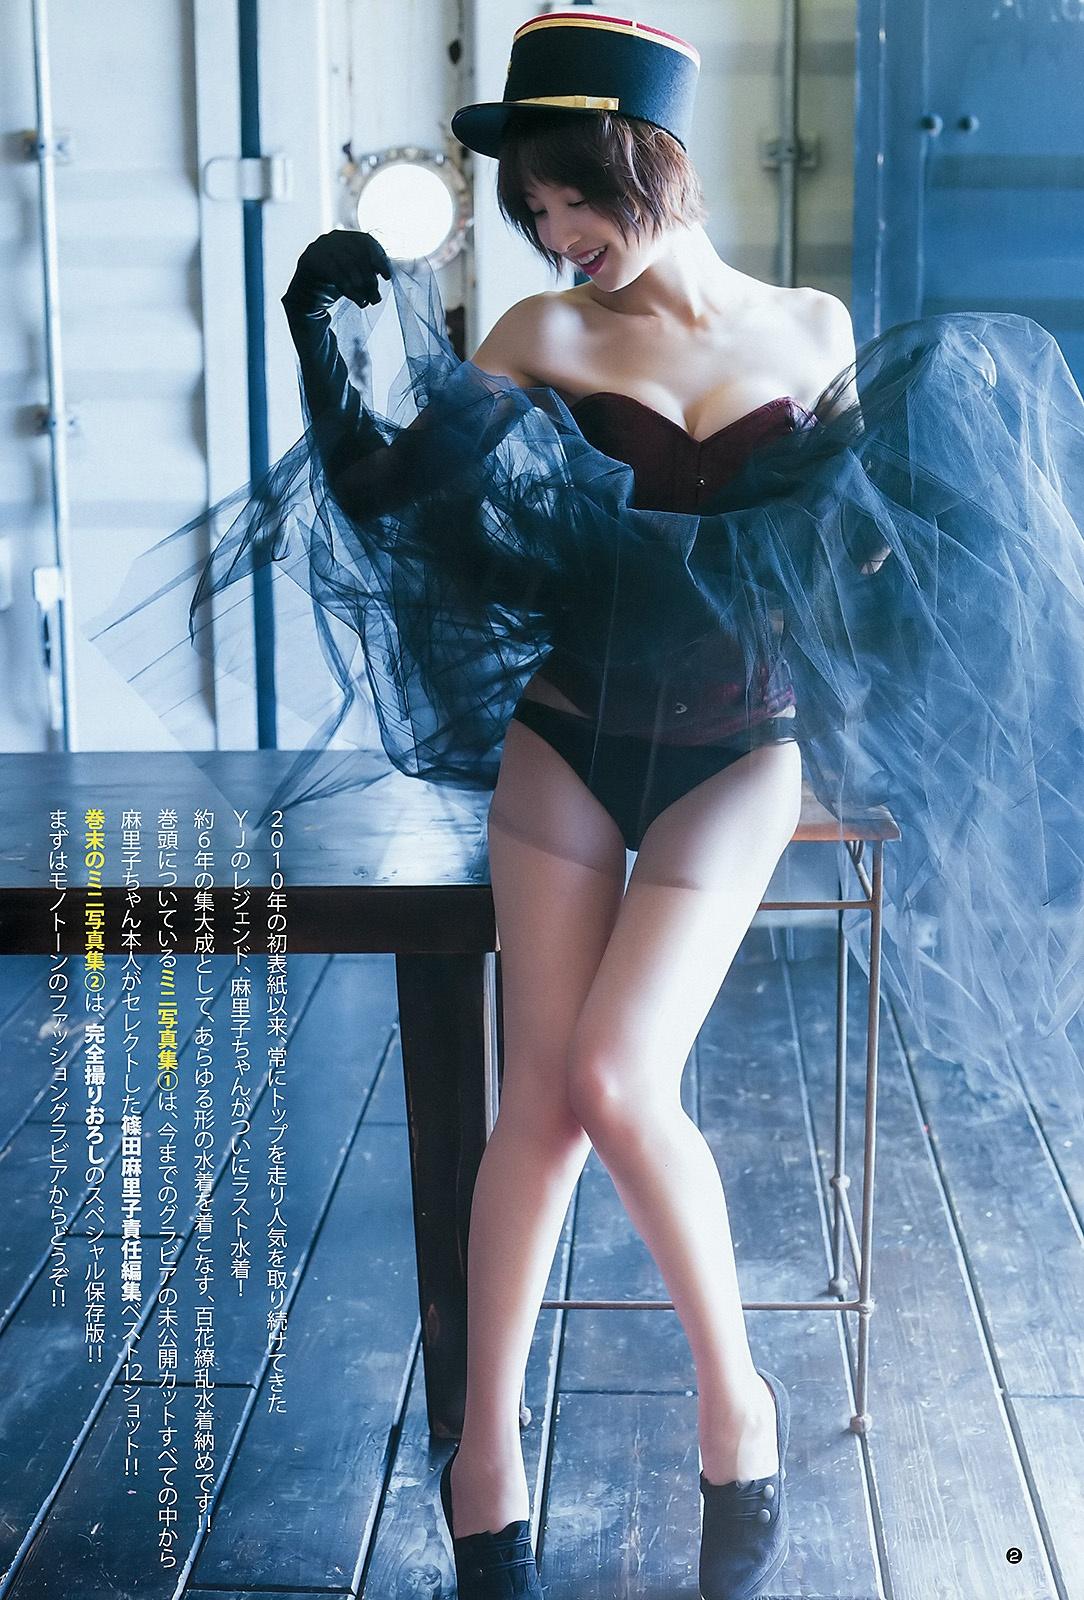 Mariko Shinoda Android Iphone Wallpaper 38433 Asiachan